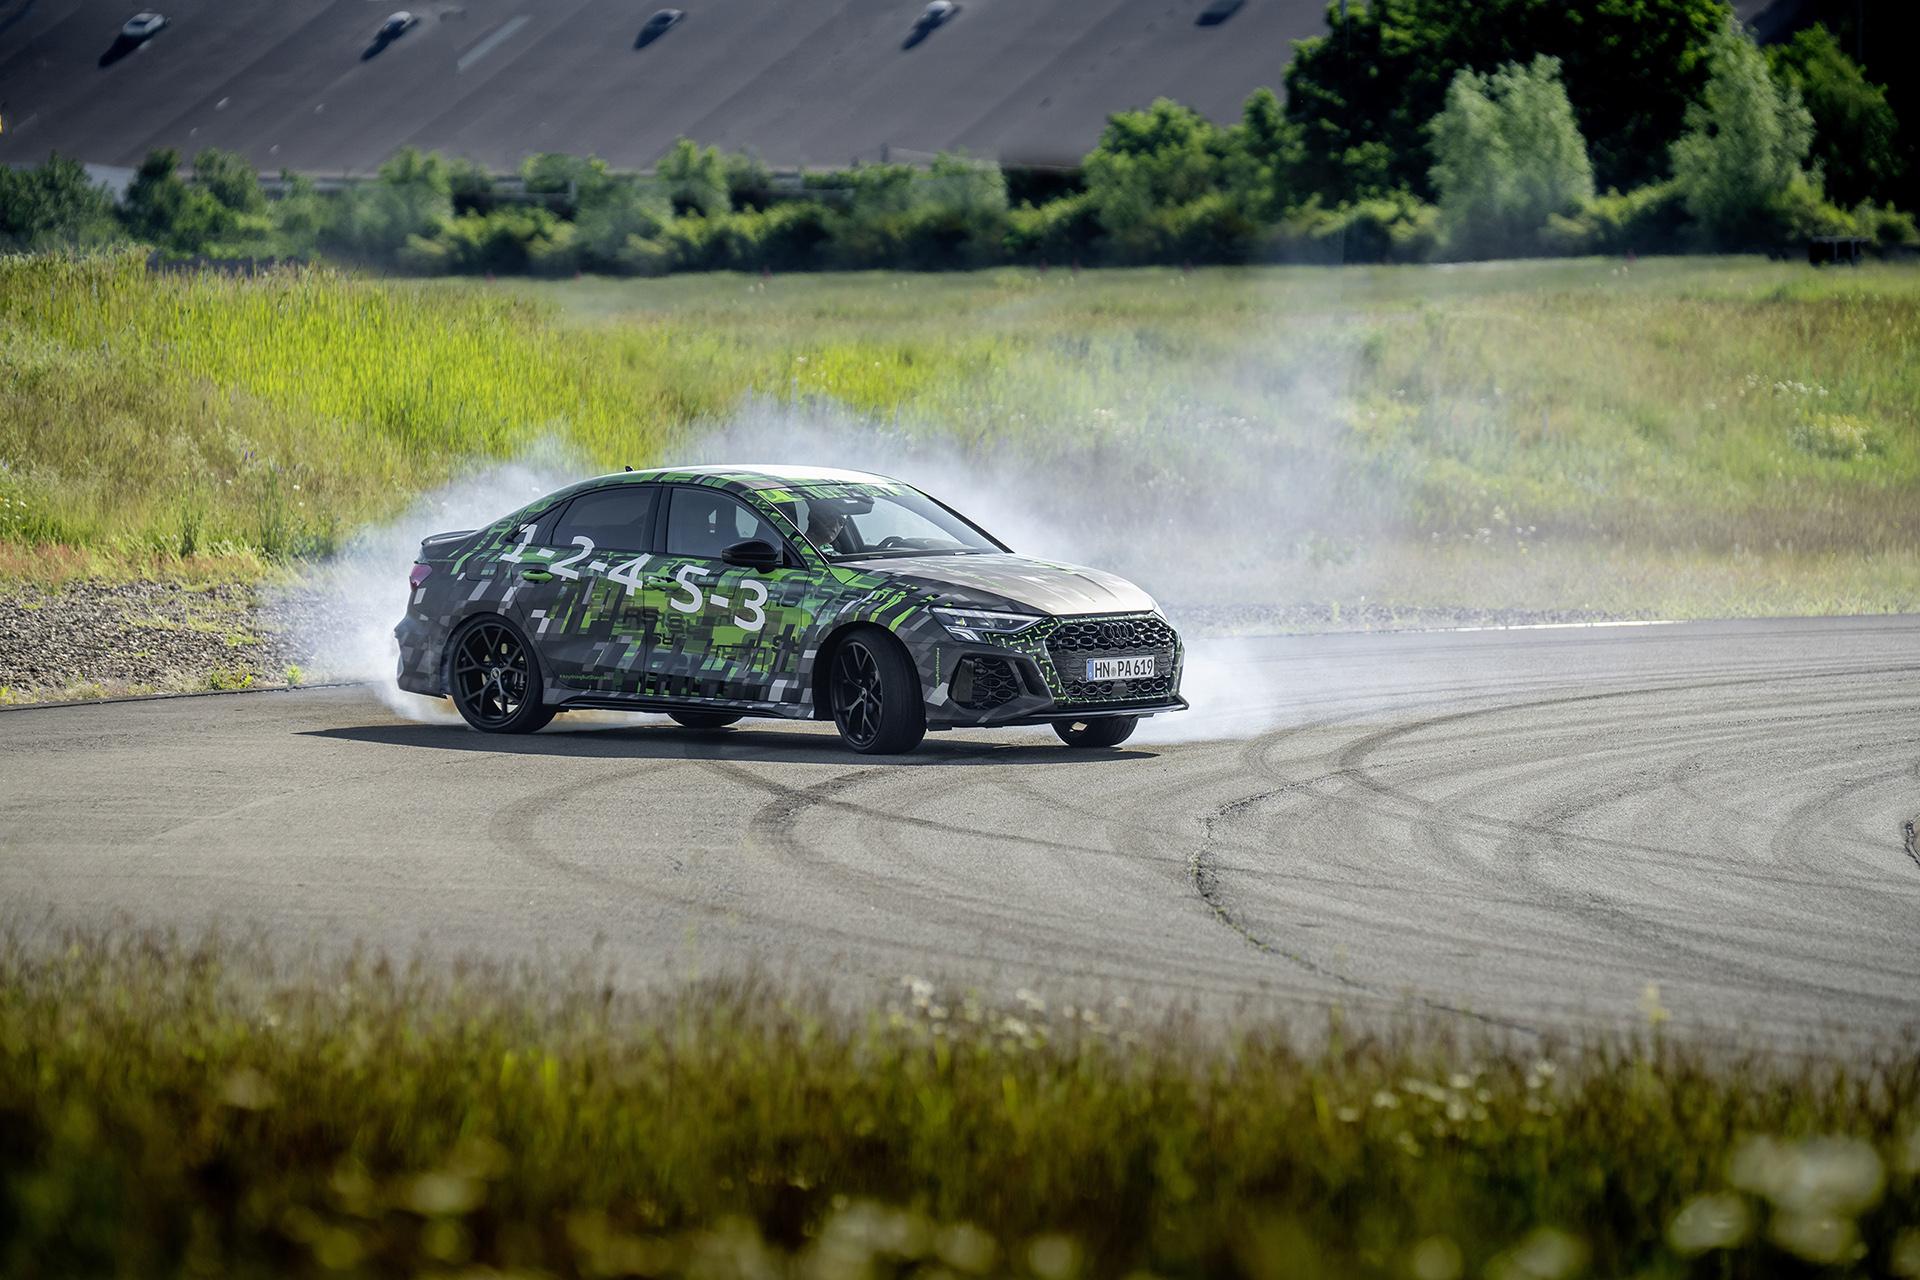 NEO AUDI RS 3 TORQUE SPLITTER 3 Πώς λειτουργεί το RS Torque Splitter του νέου Audi RS 3 Audi, Audi RS, Audi RS3, RS3, zblog, ειδήσεις, Νέα, τεχνικά